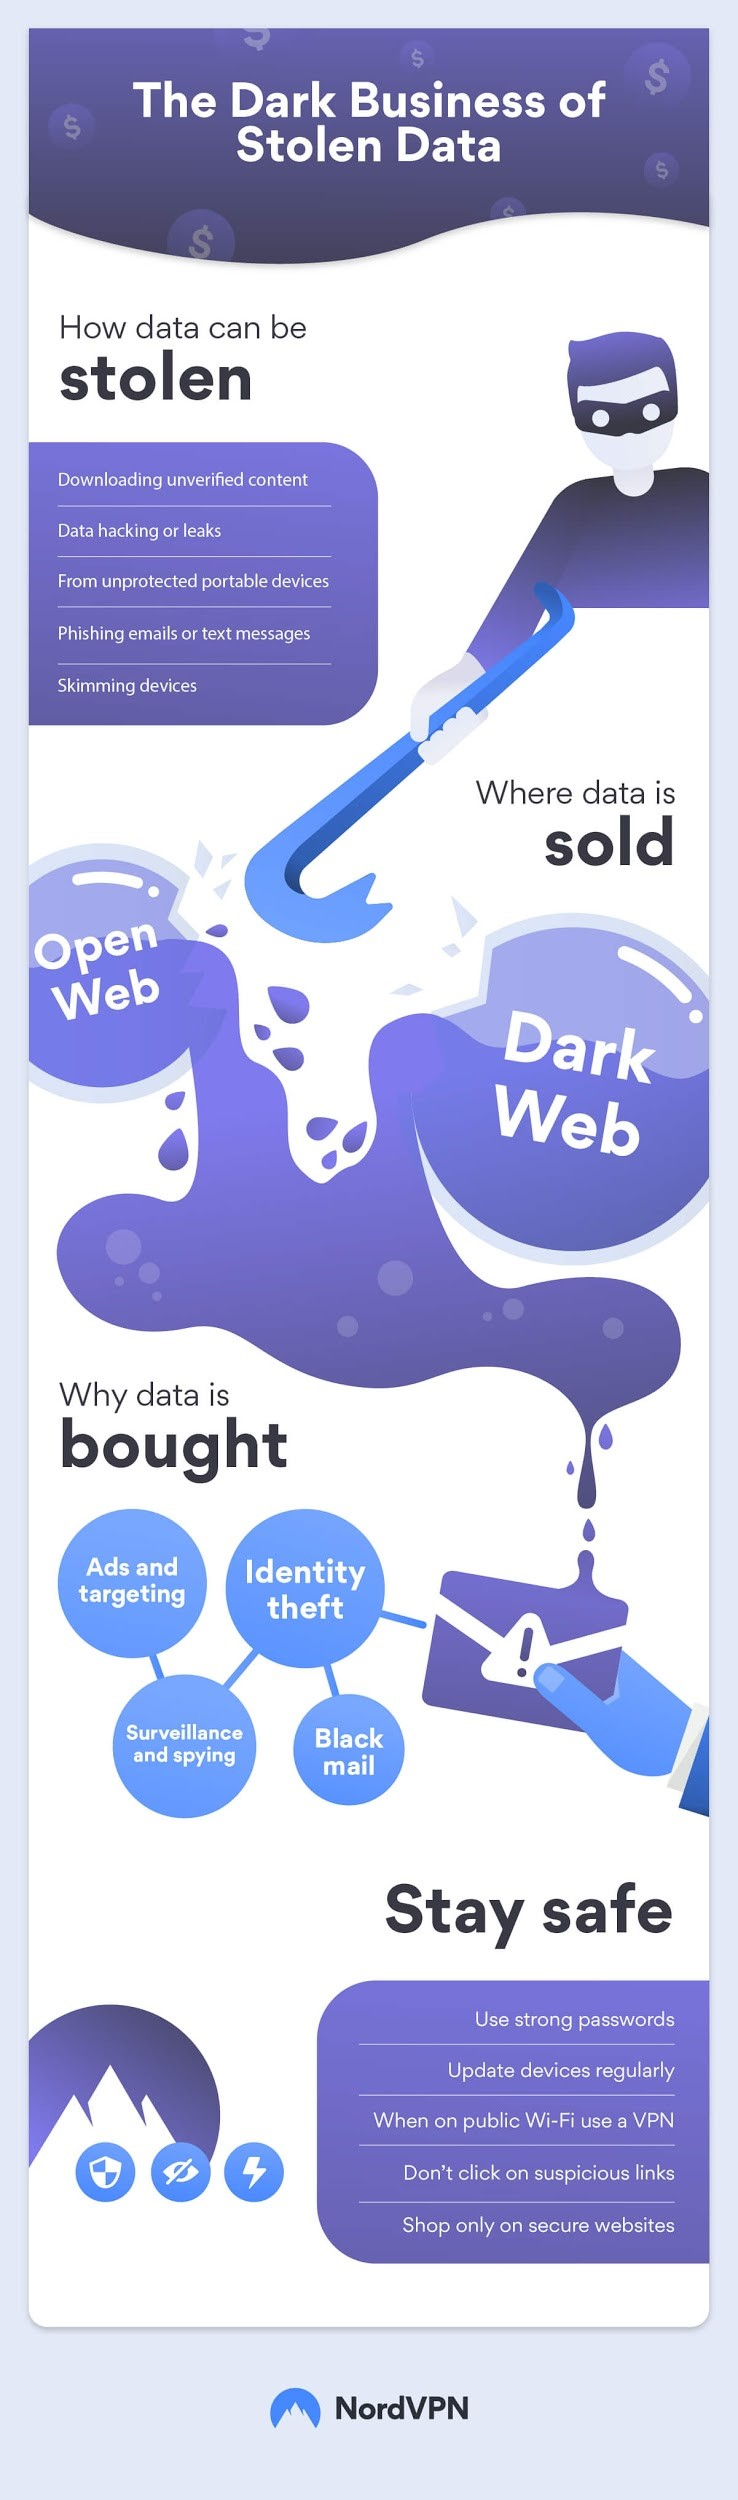 Infographic: The Dark Business Of Stolen Data | The IT Nerd